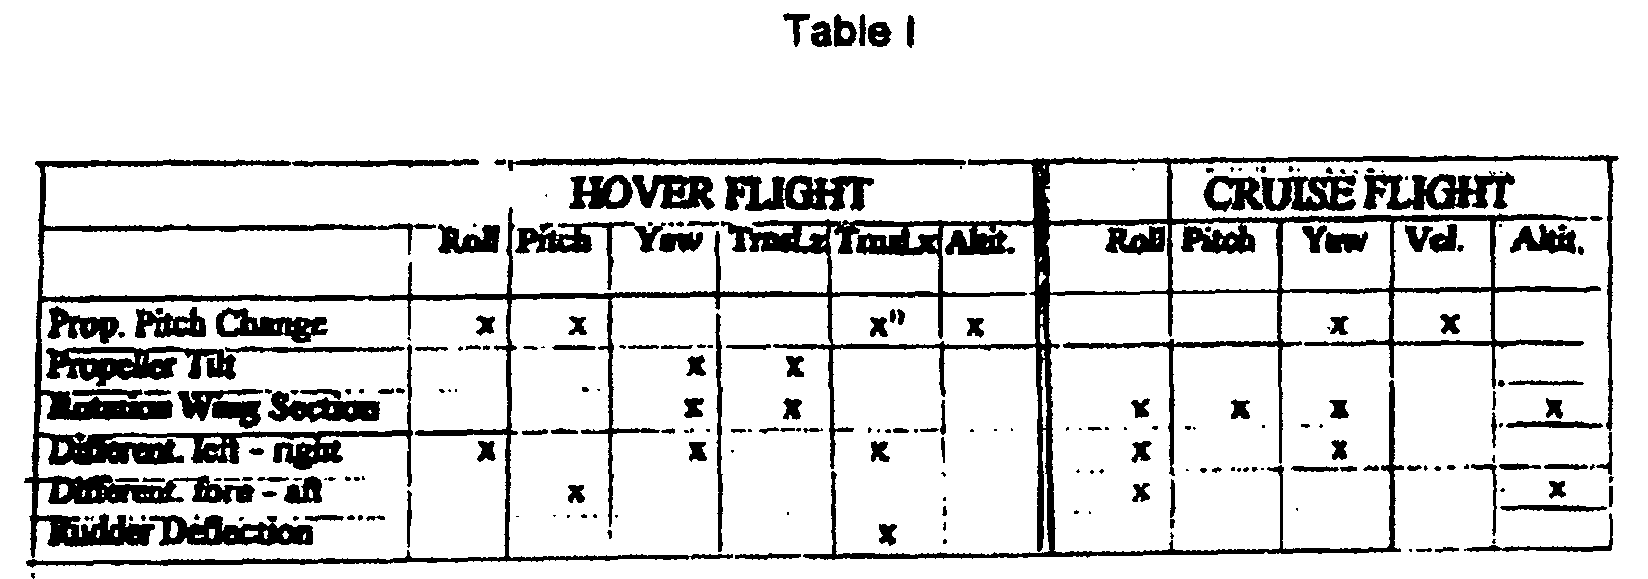 EP1211173A2 - Hybrid aircraft - Google Patents